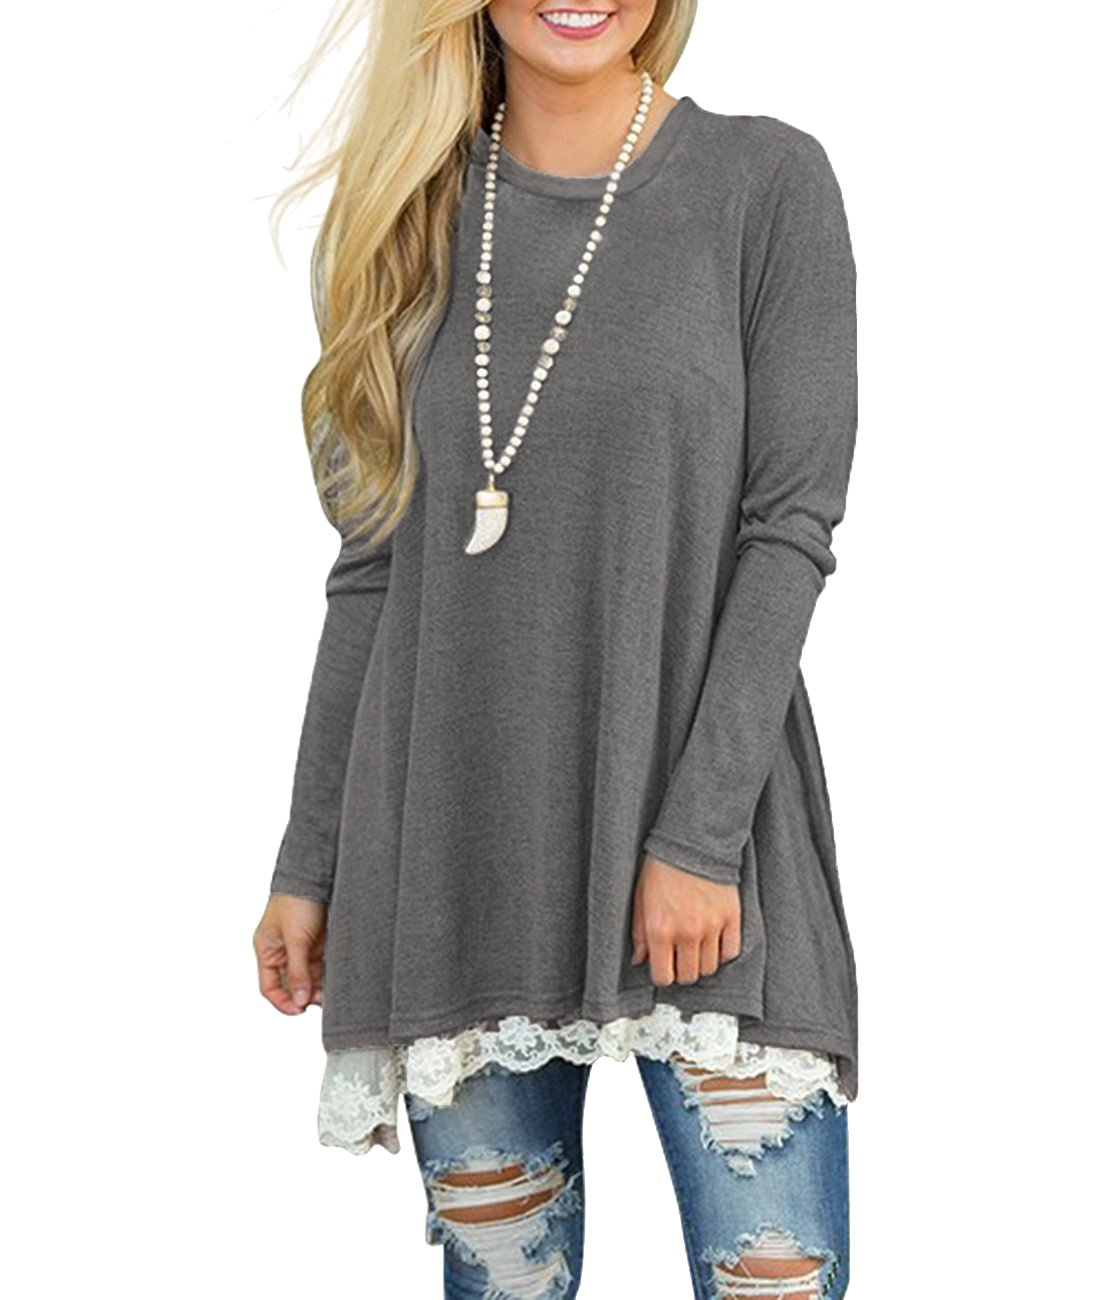 MOLERANI Women's Casual Lace Long Sleeve Tunic Top Blouse (L, New Grey)